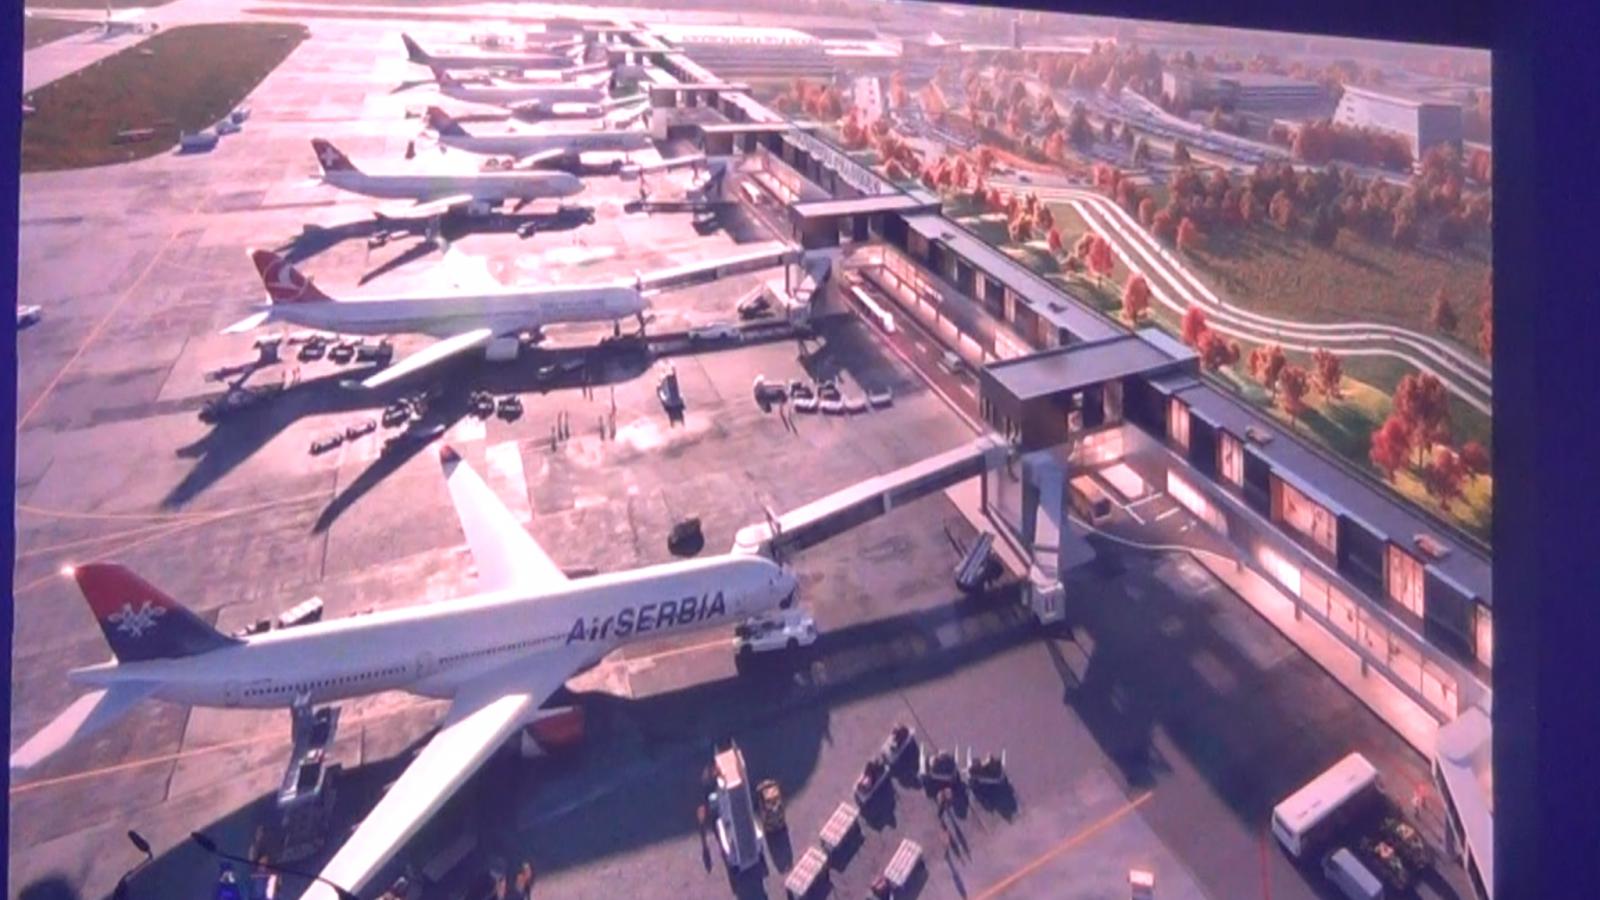 [POSLEDNJA VEST] Prve fotografije mogućeg novog izgleda Aerodroma Nikola Tesla: Drugi sprat aerodroma, najavljeni loukosteri i Norvidžn Er?